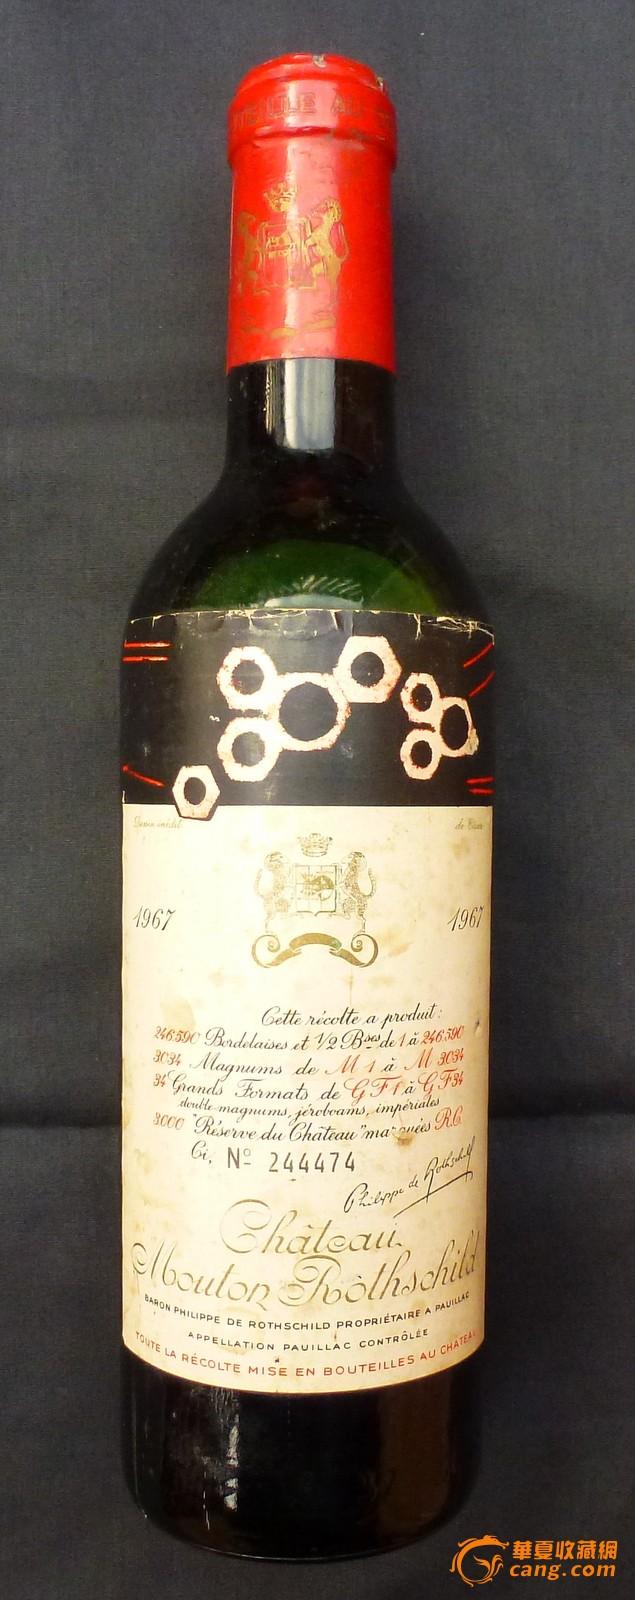 005 木桐红酒一小瓶(1967年 375ml)1967 chateau mouton rothschild